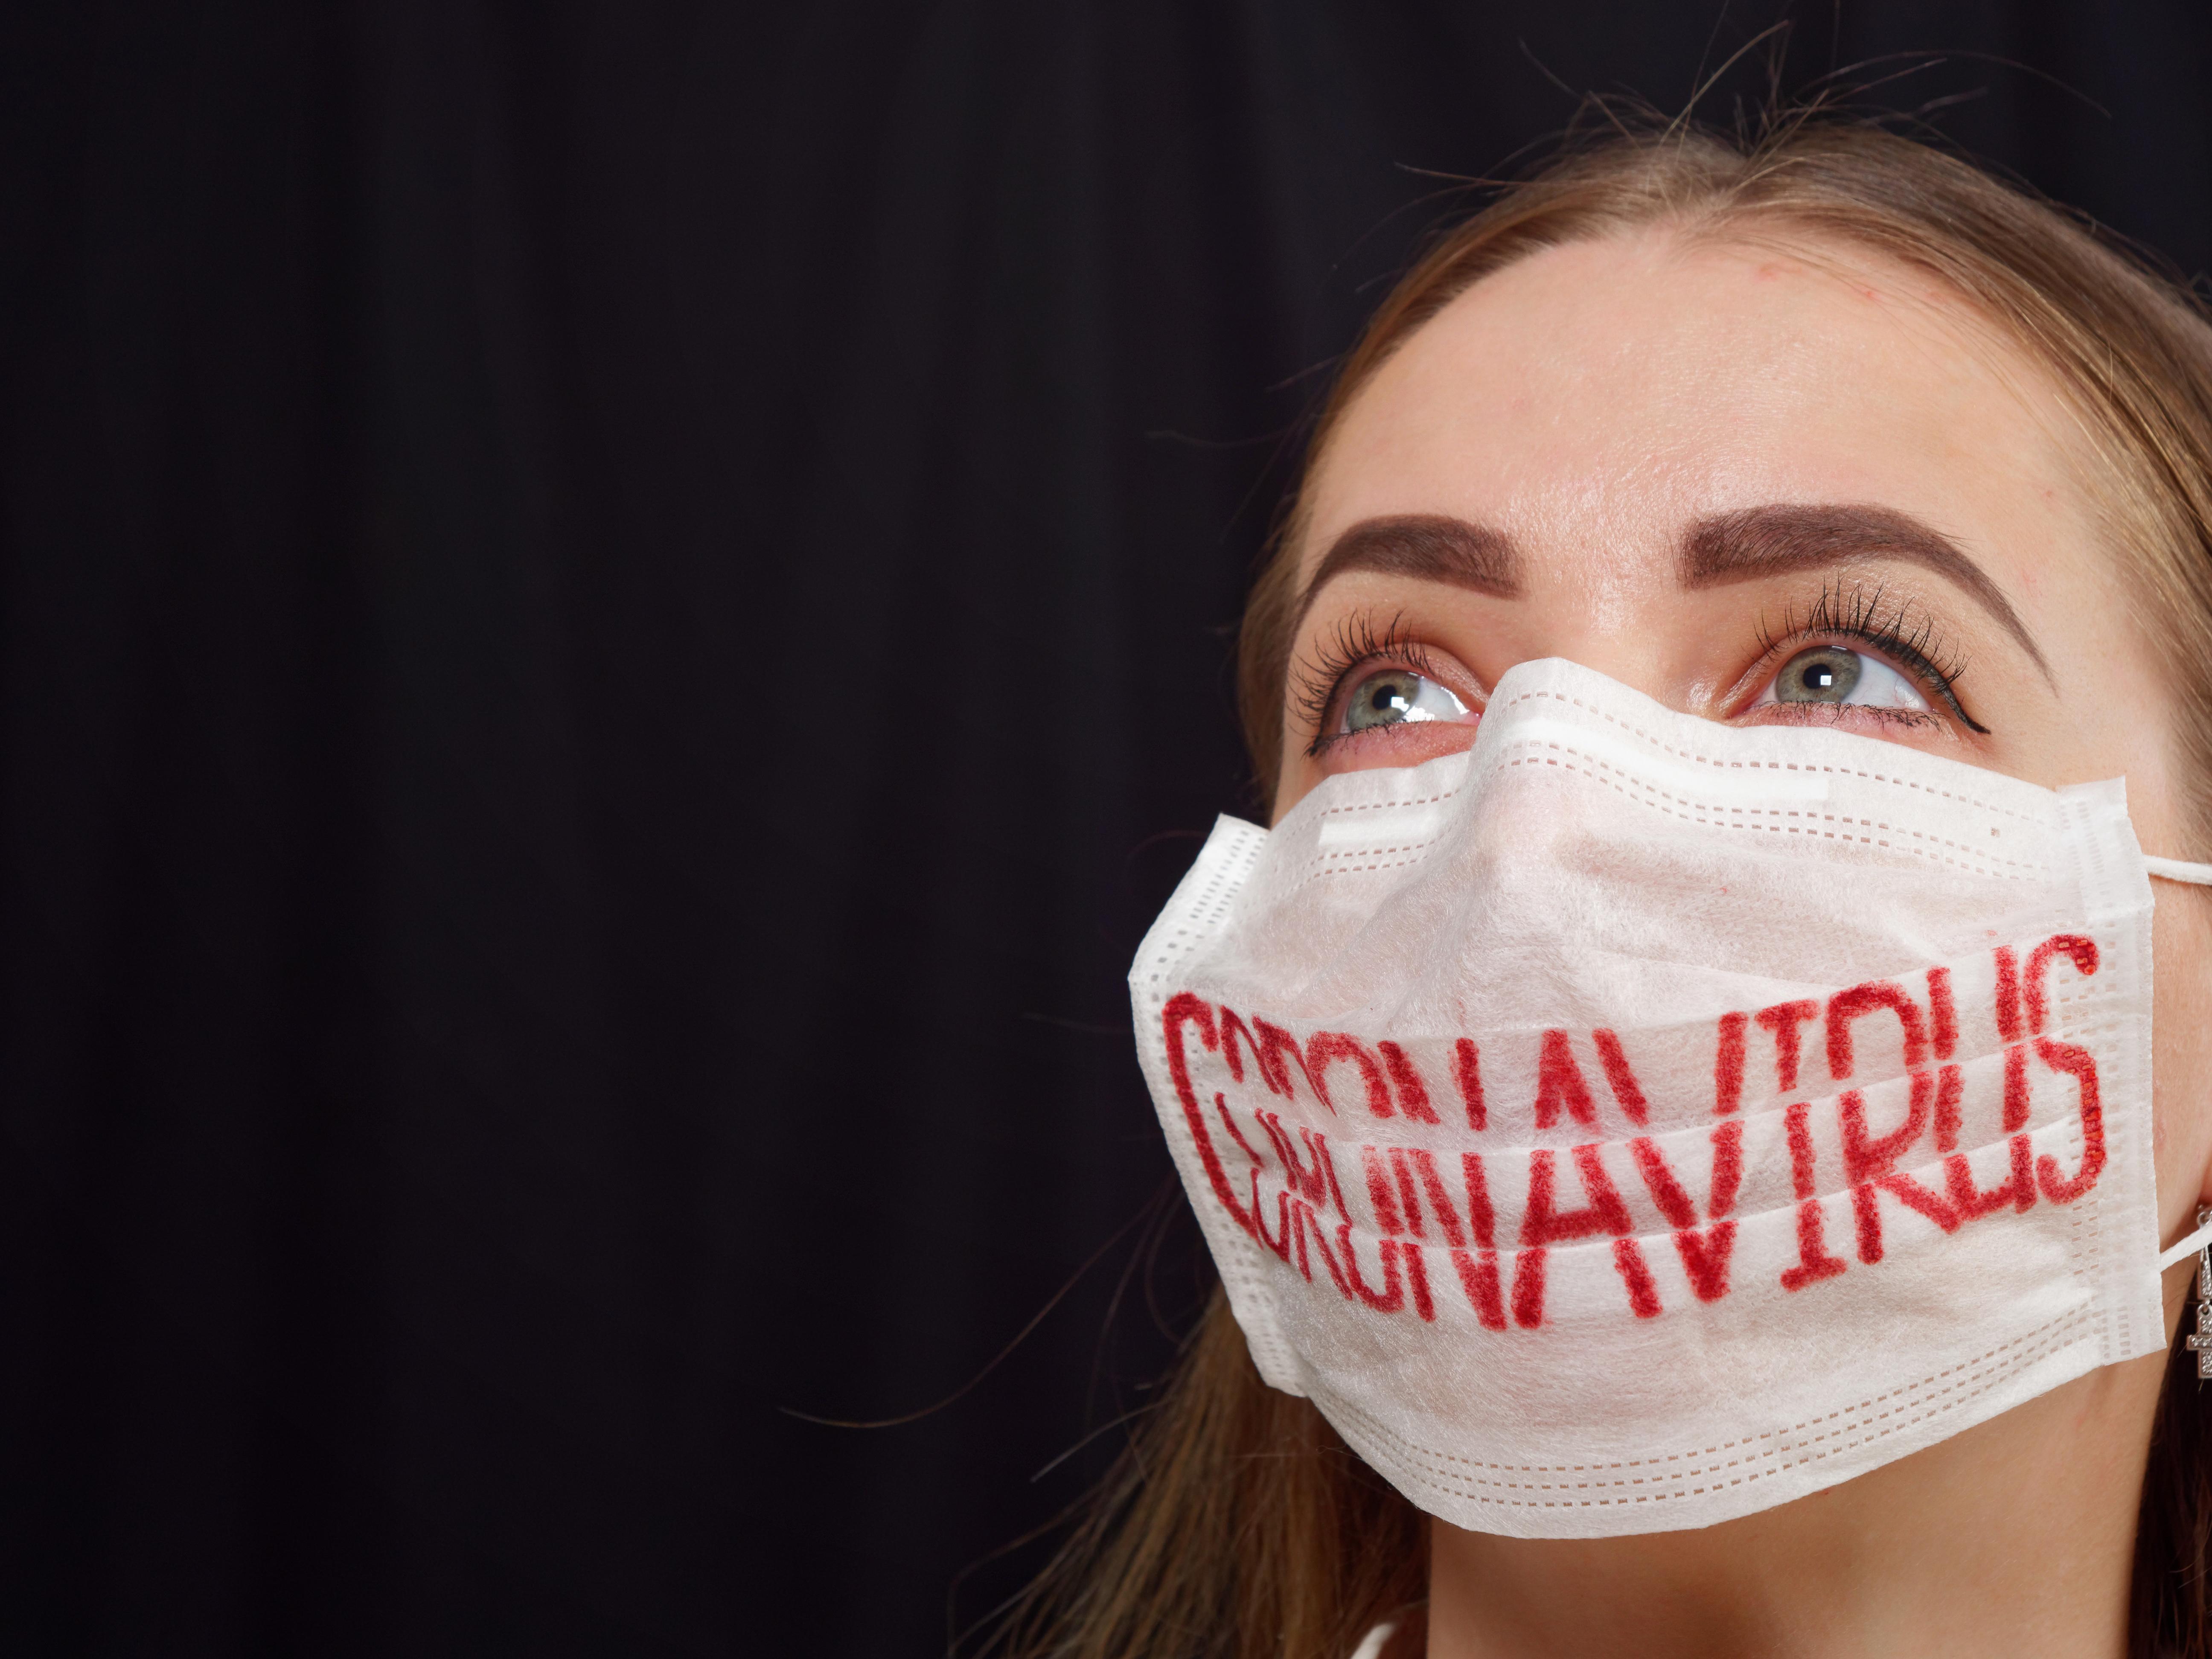 antiviral face mask on a gray background. coronavirus epidemic.